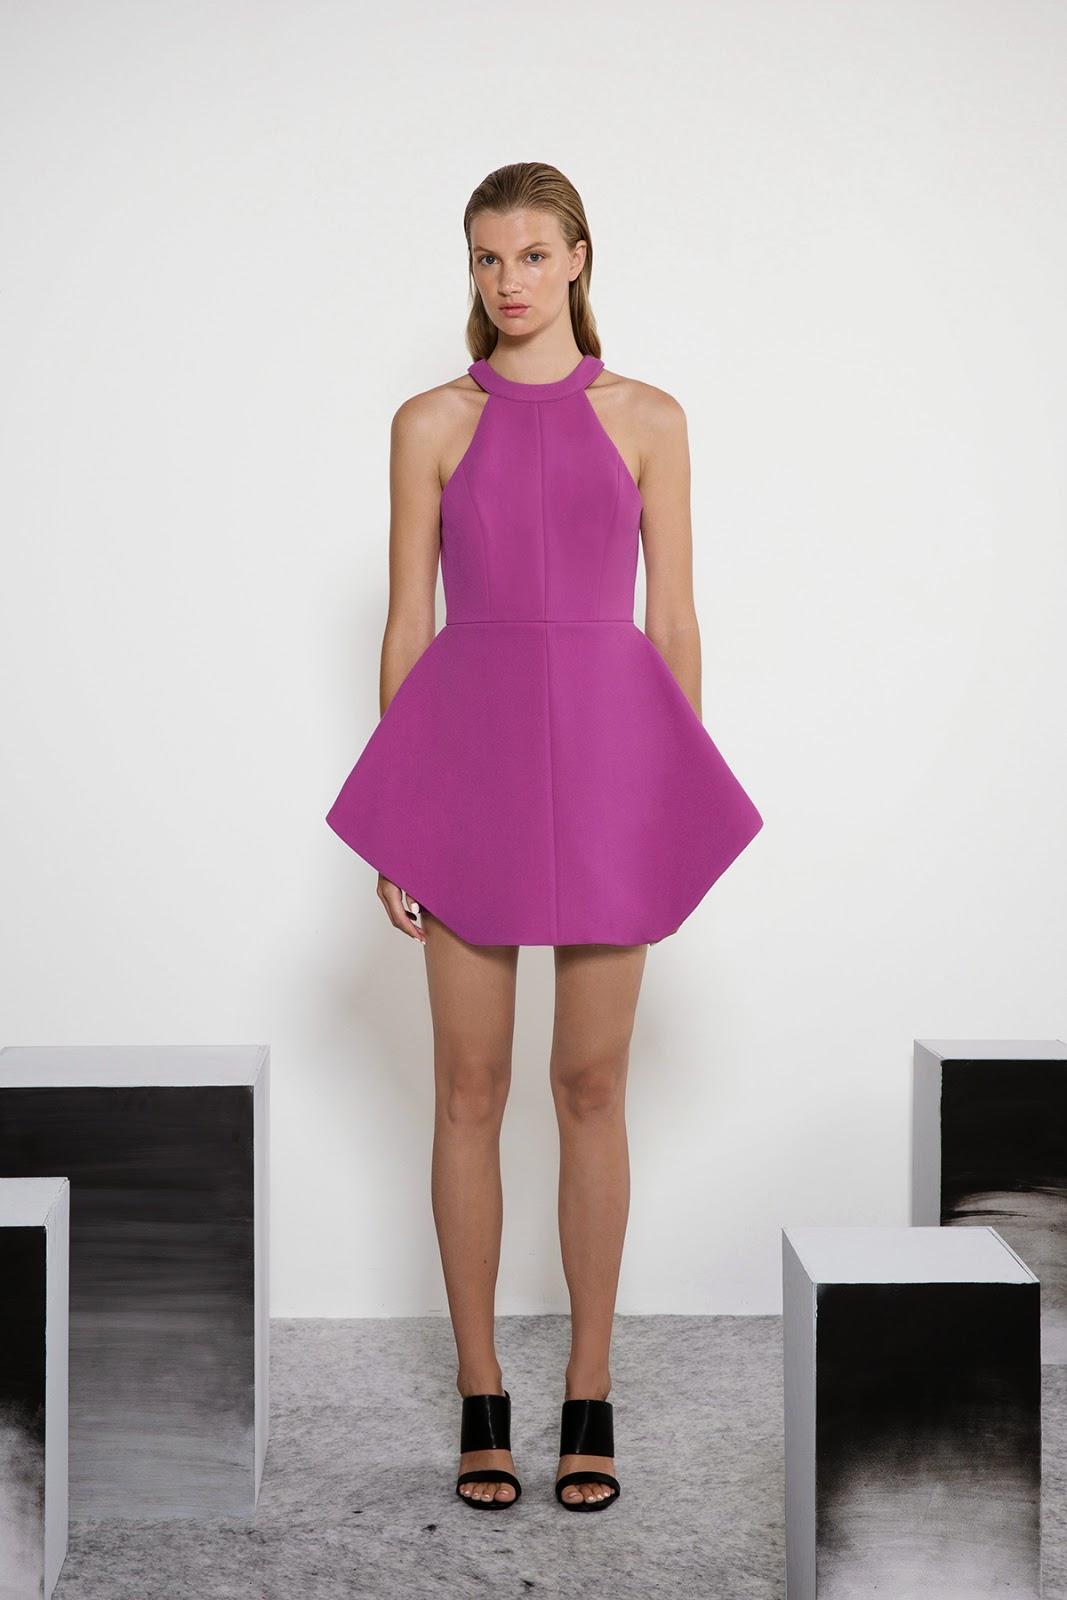 WHOLESALE Australian Fashion Labels 58